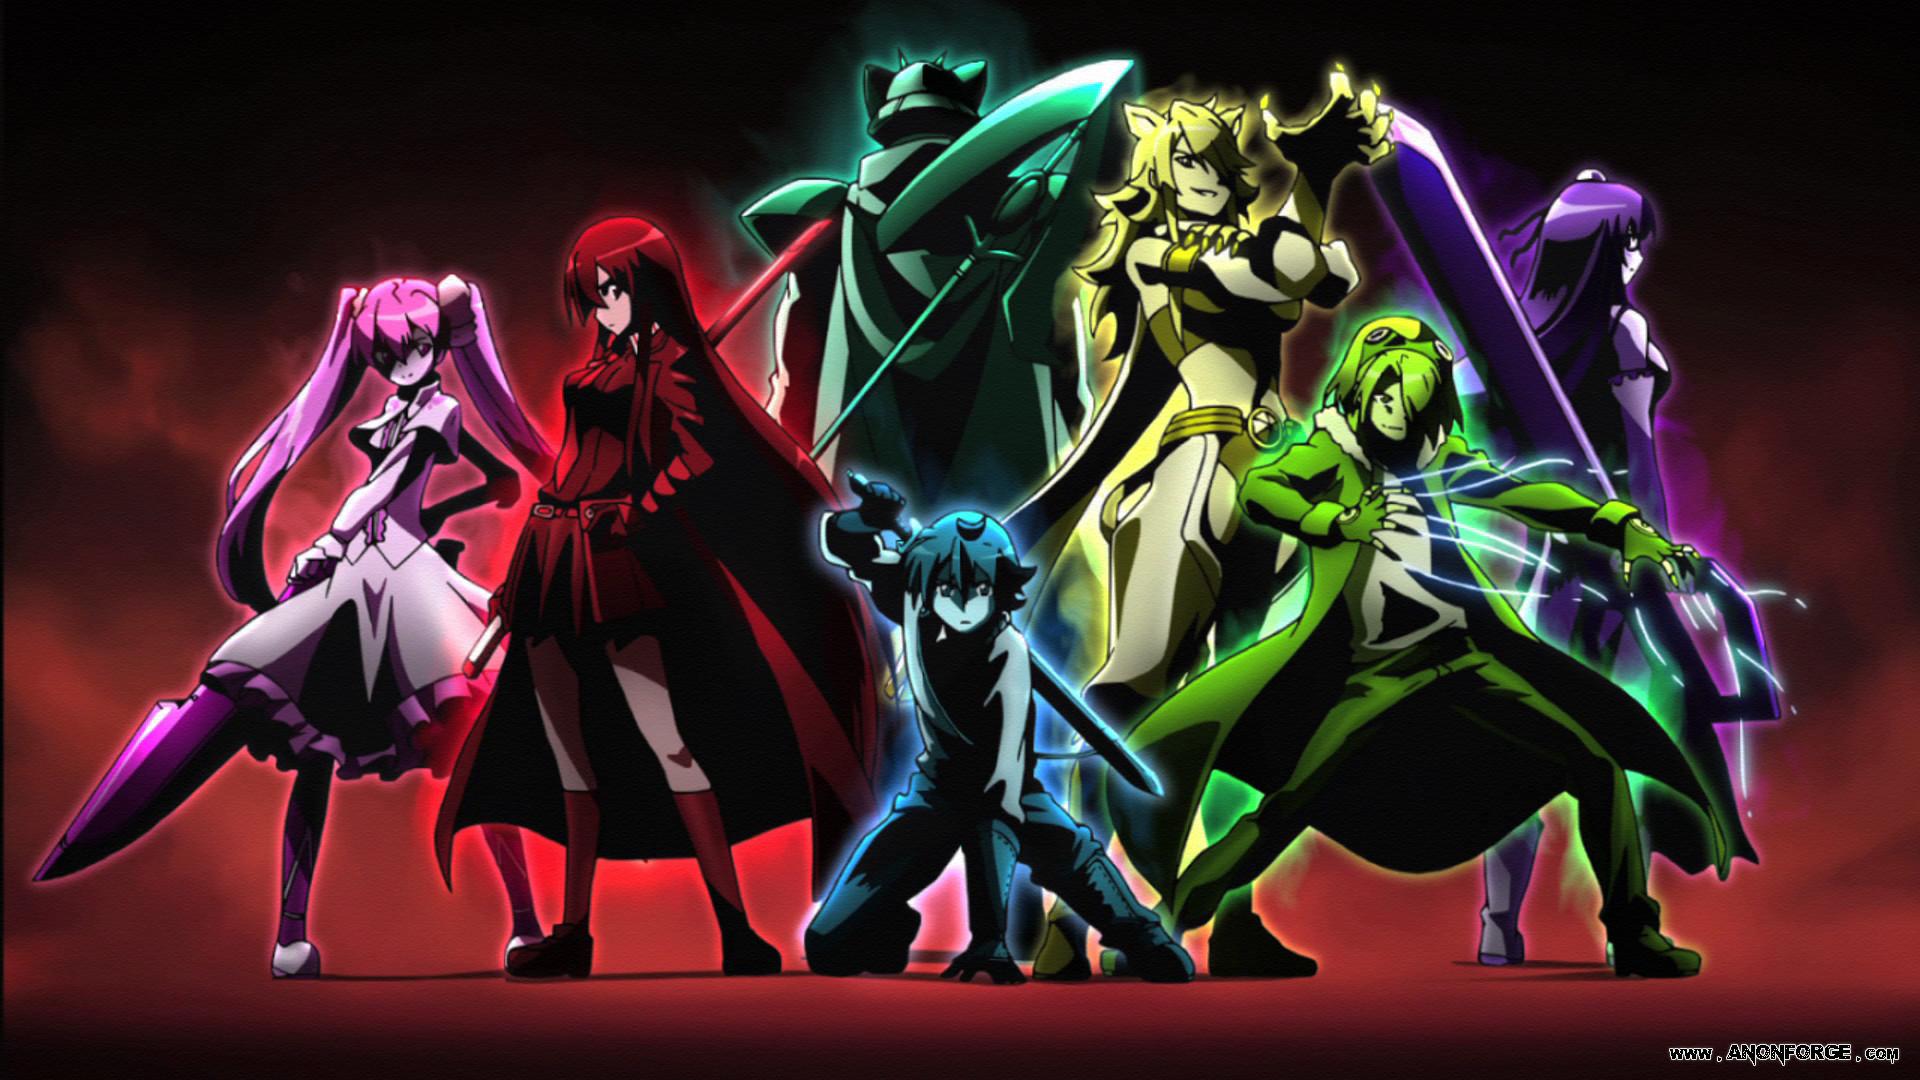 http___wall.anonforge.com_wp-content_uploads_Anime_AkameGaKill_a_night-raid-anime-akame-ga-